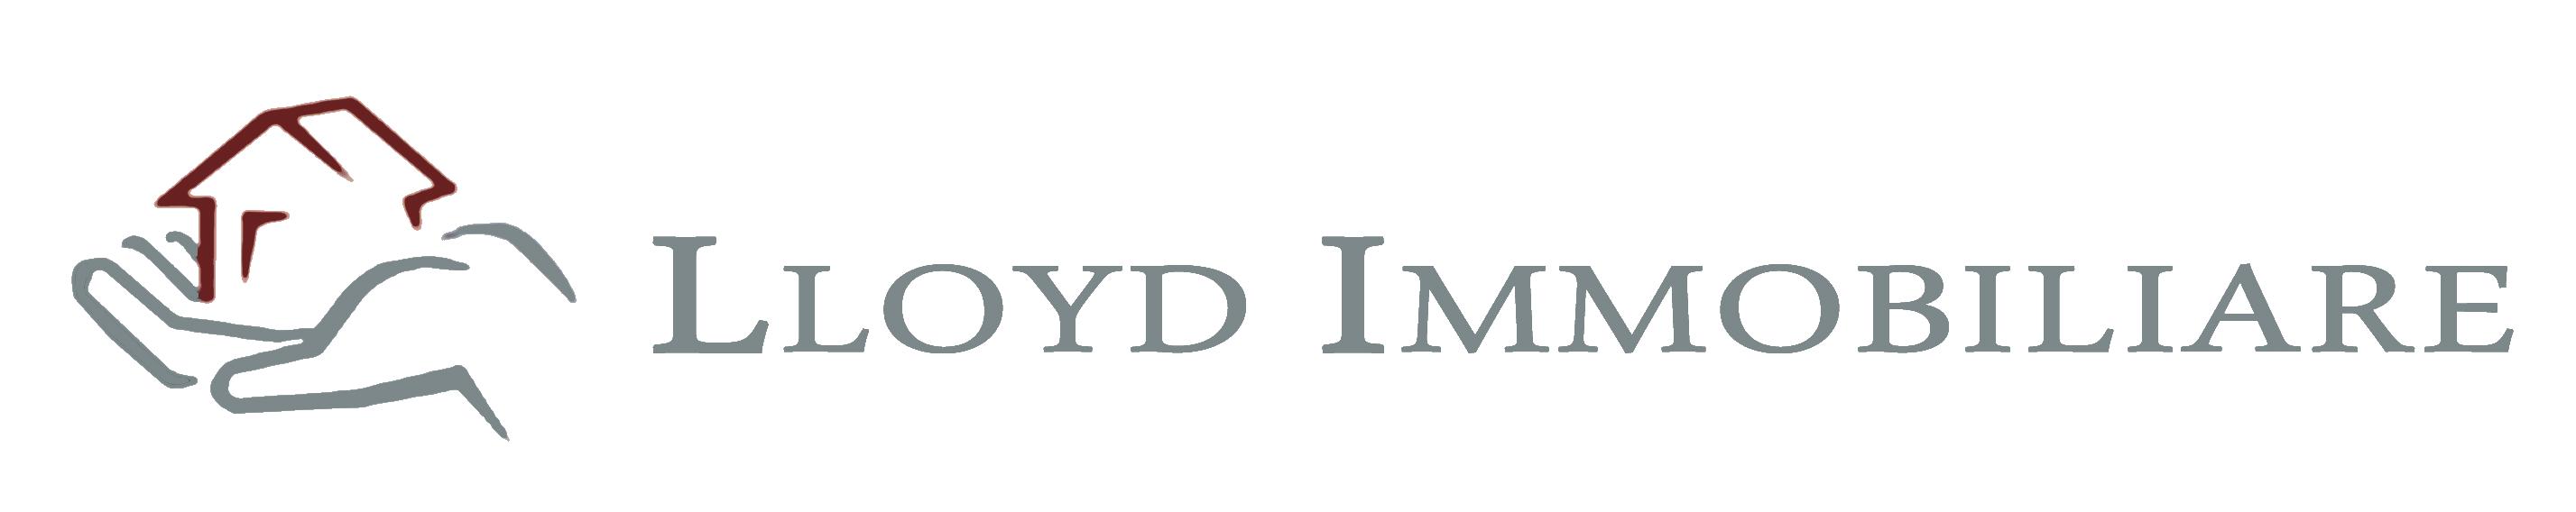 LLOYD IMMOBILIARE SAS